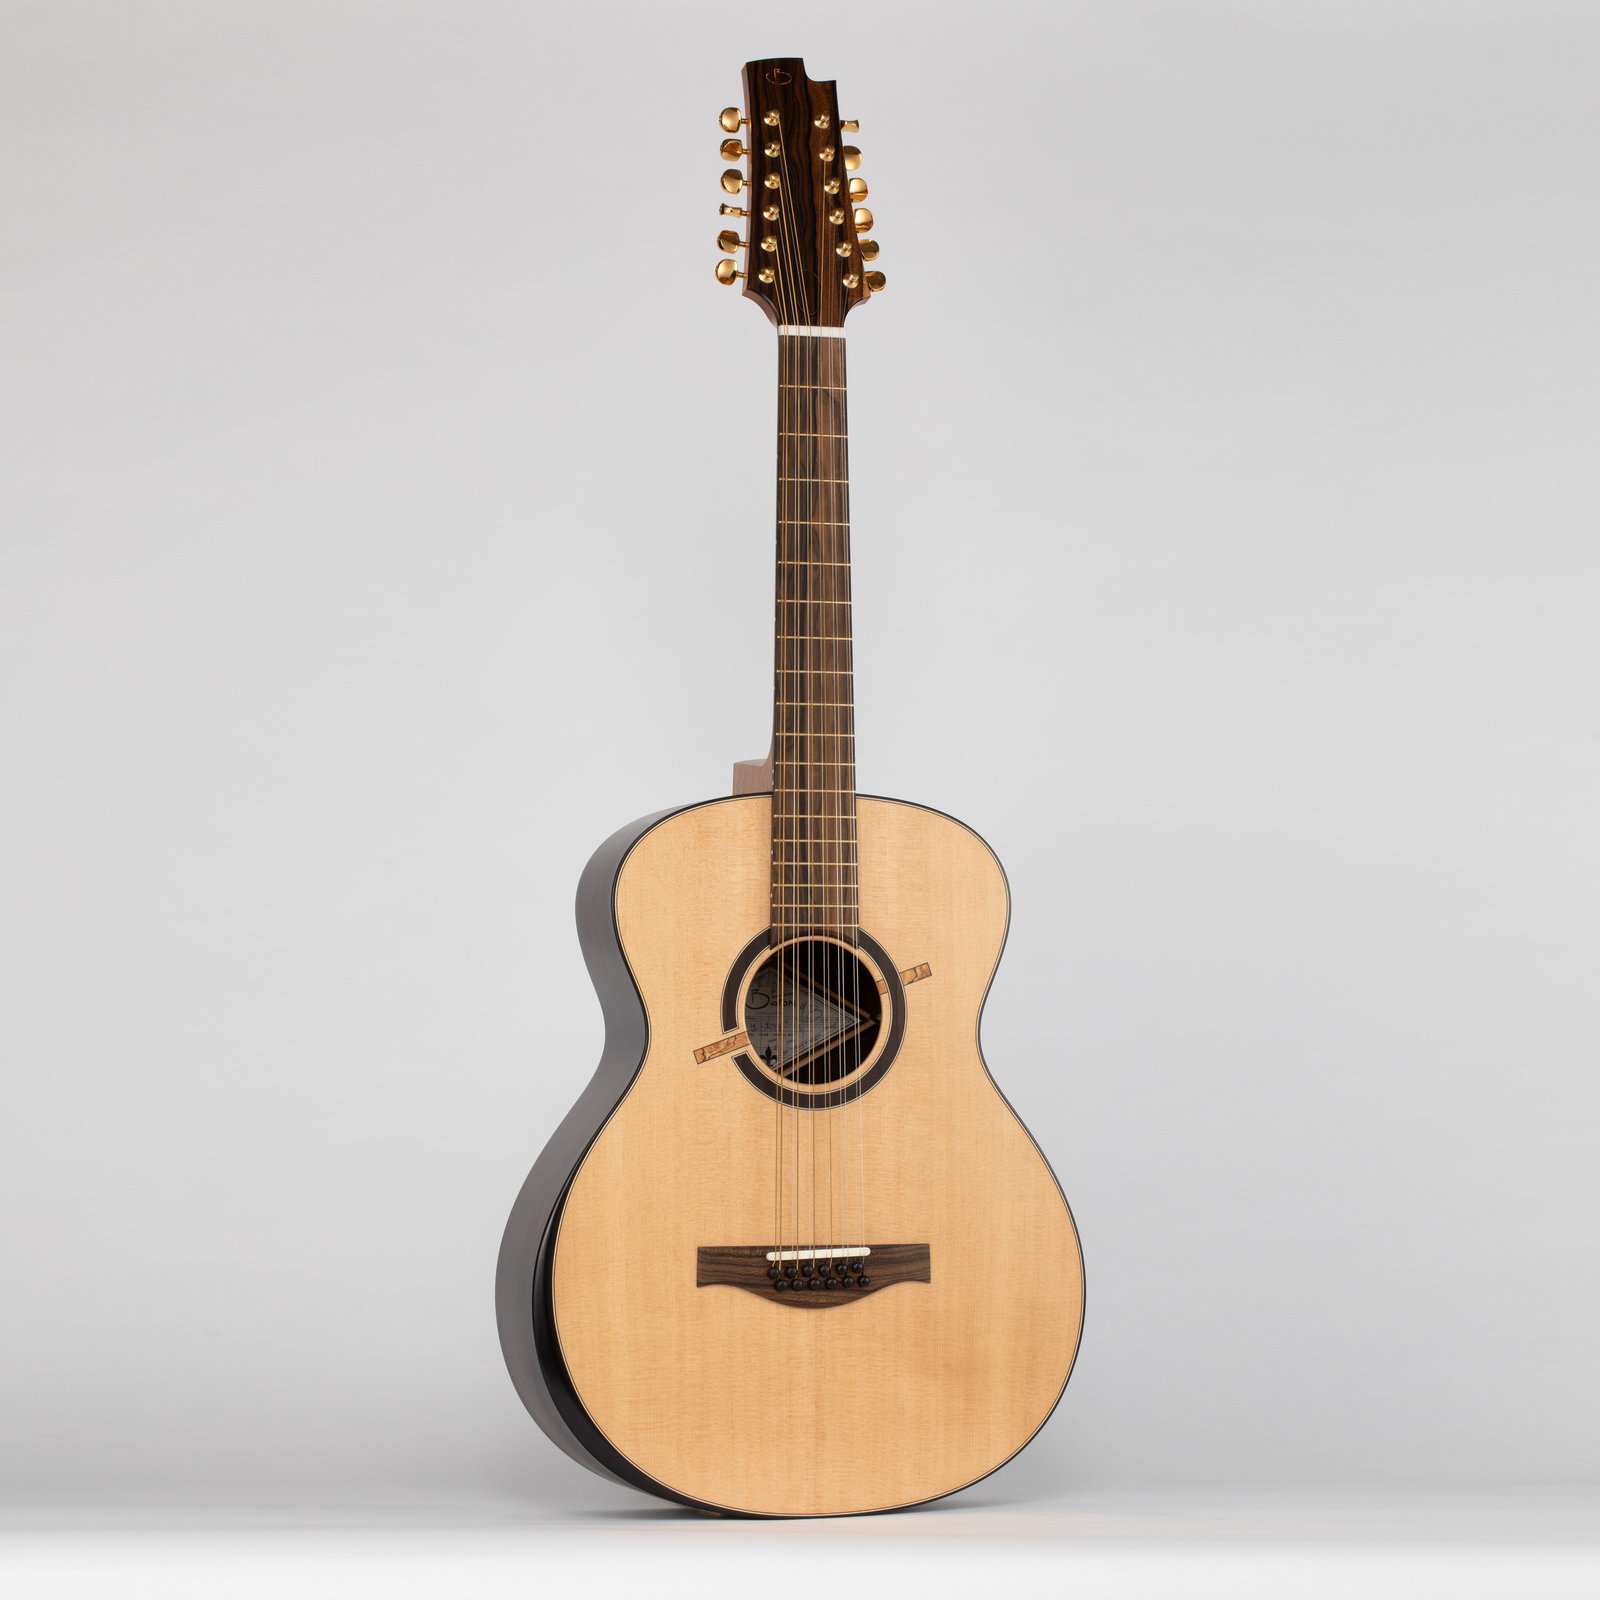 Guitare Baron 12 cordes (fabrication en cours) - Page 2 19121202365931250